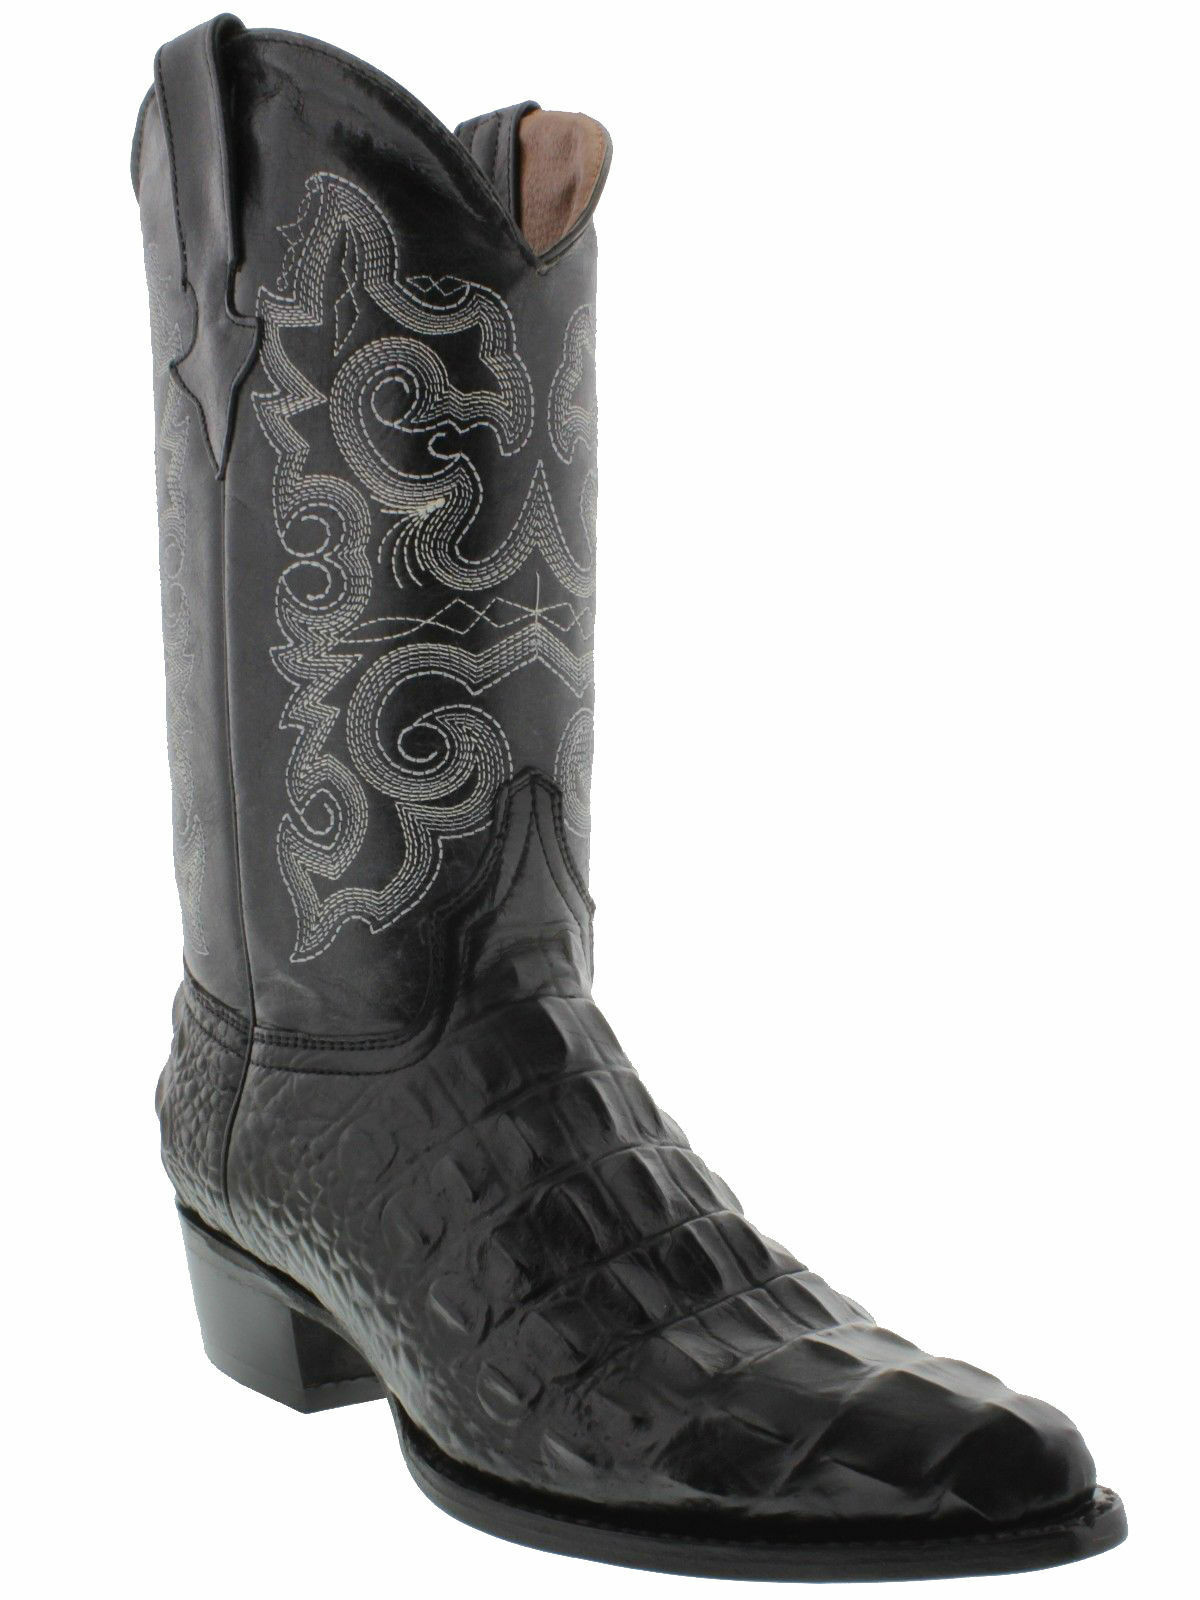 DAKOTA Men's 8'' 517 Quad Comfort Work Boots Steel Toe Composite Plate Brown 12W